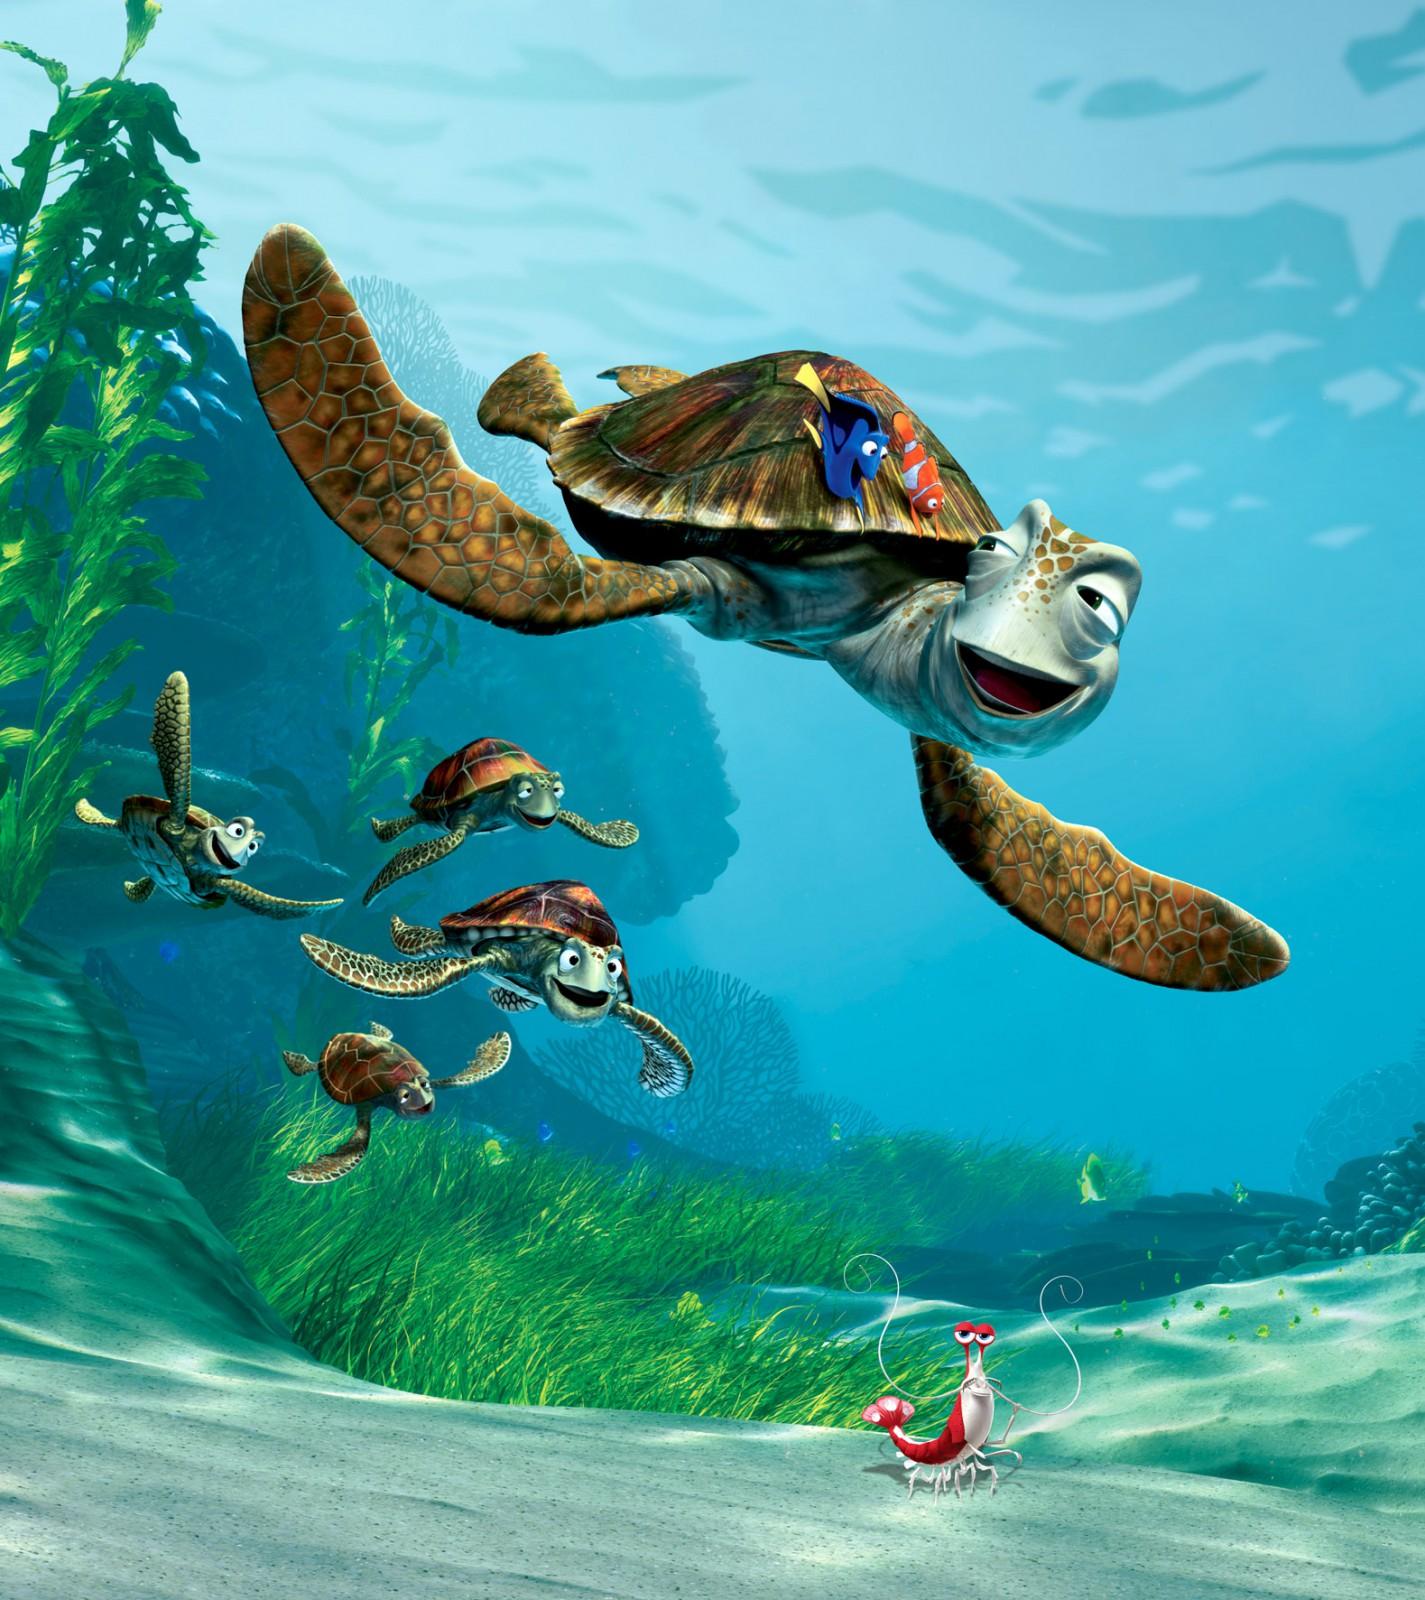 Disney Xl Photo Wallpaper Mural Finding Nemo Crush